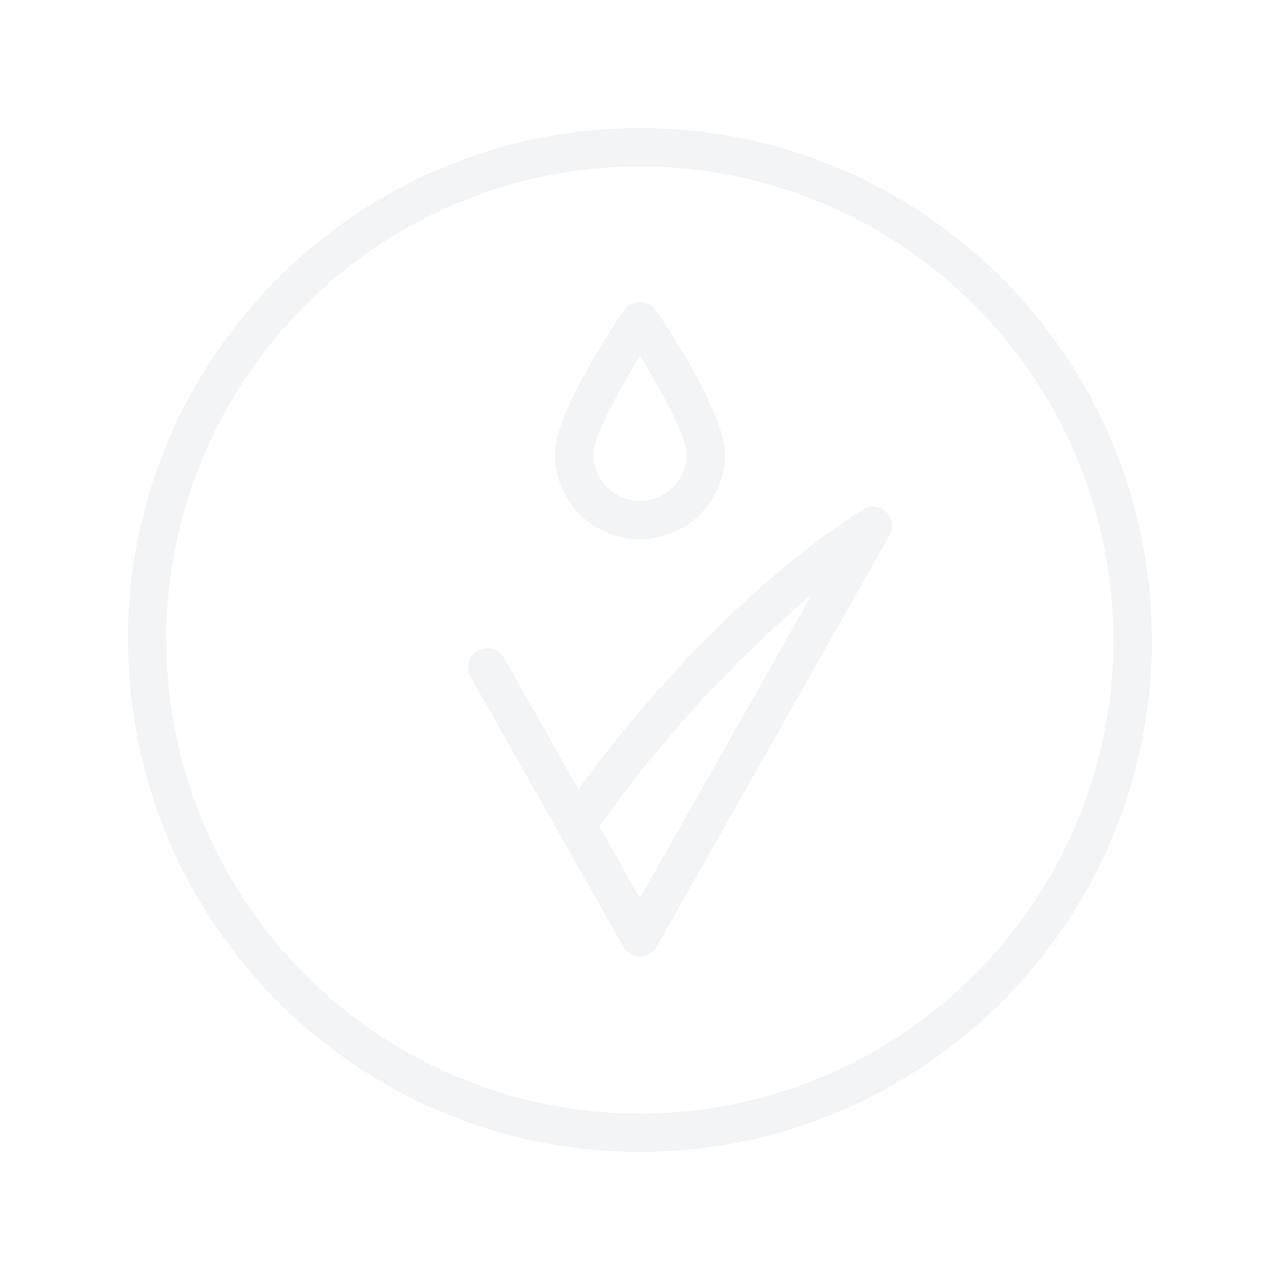 ARTDECO Long Lasting Khol Eyeliner No.01 Black 1.2g